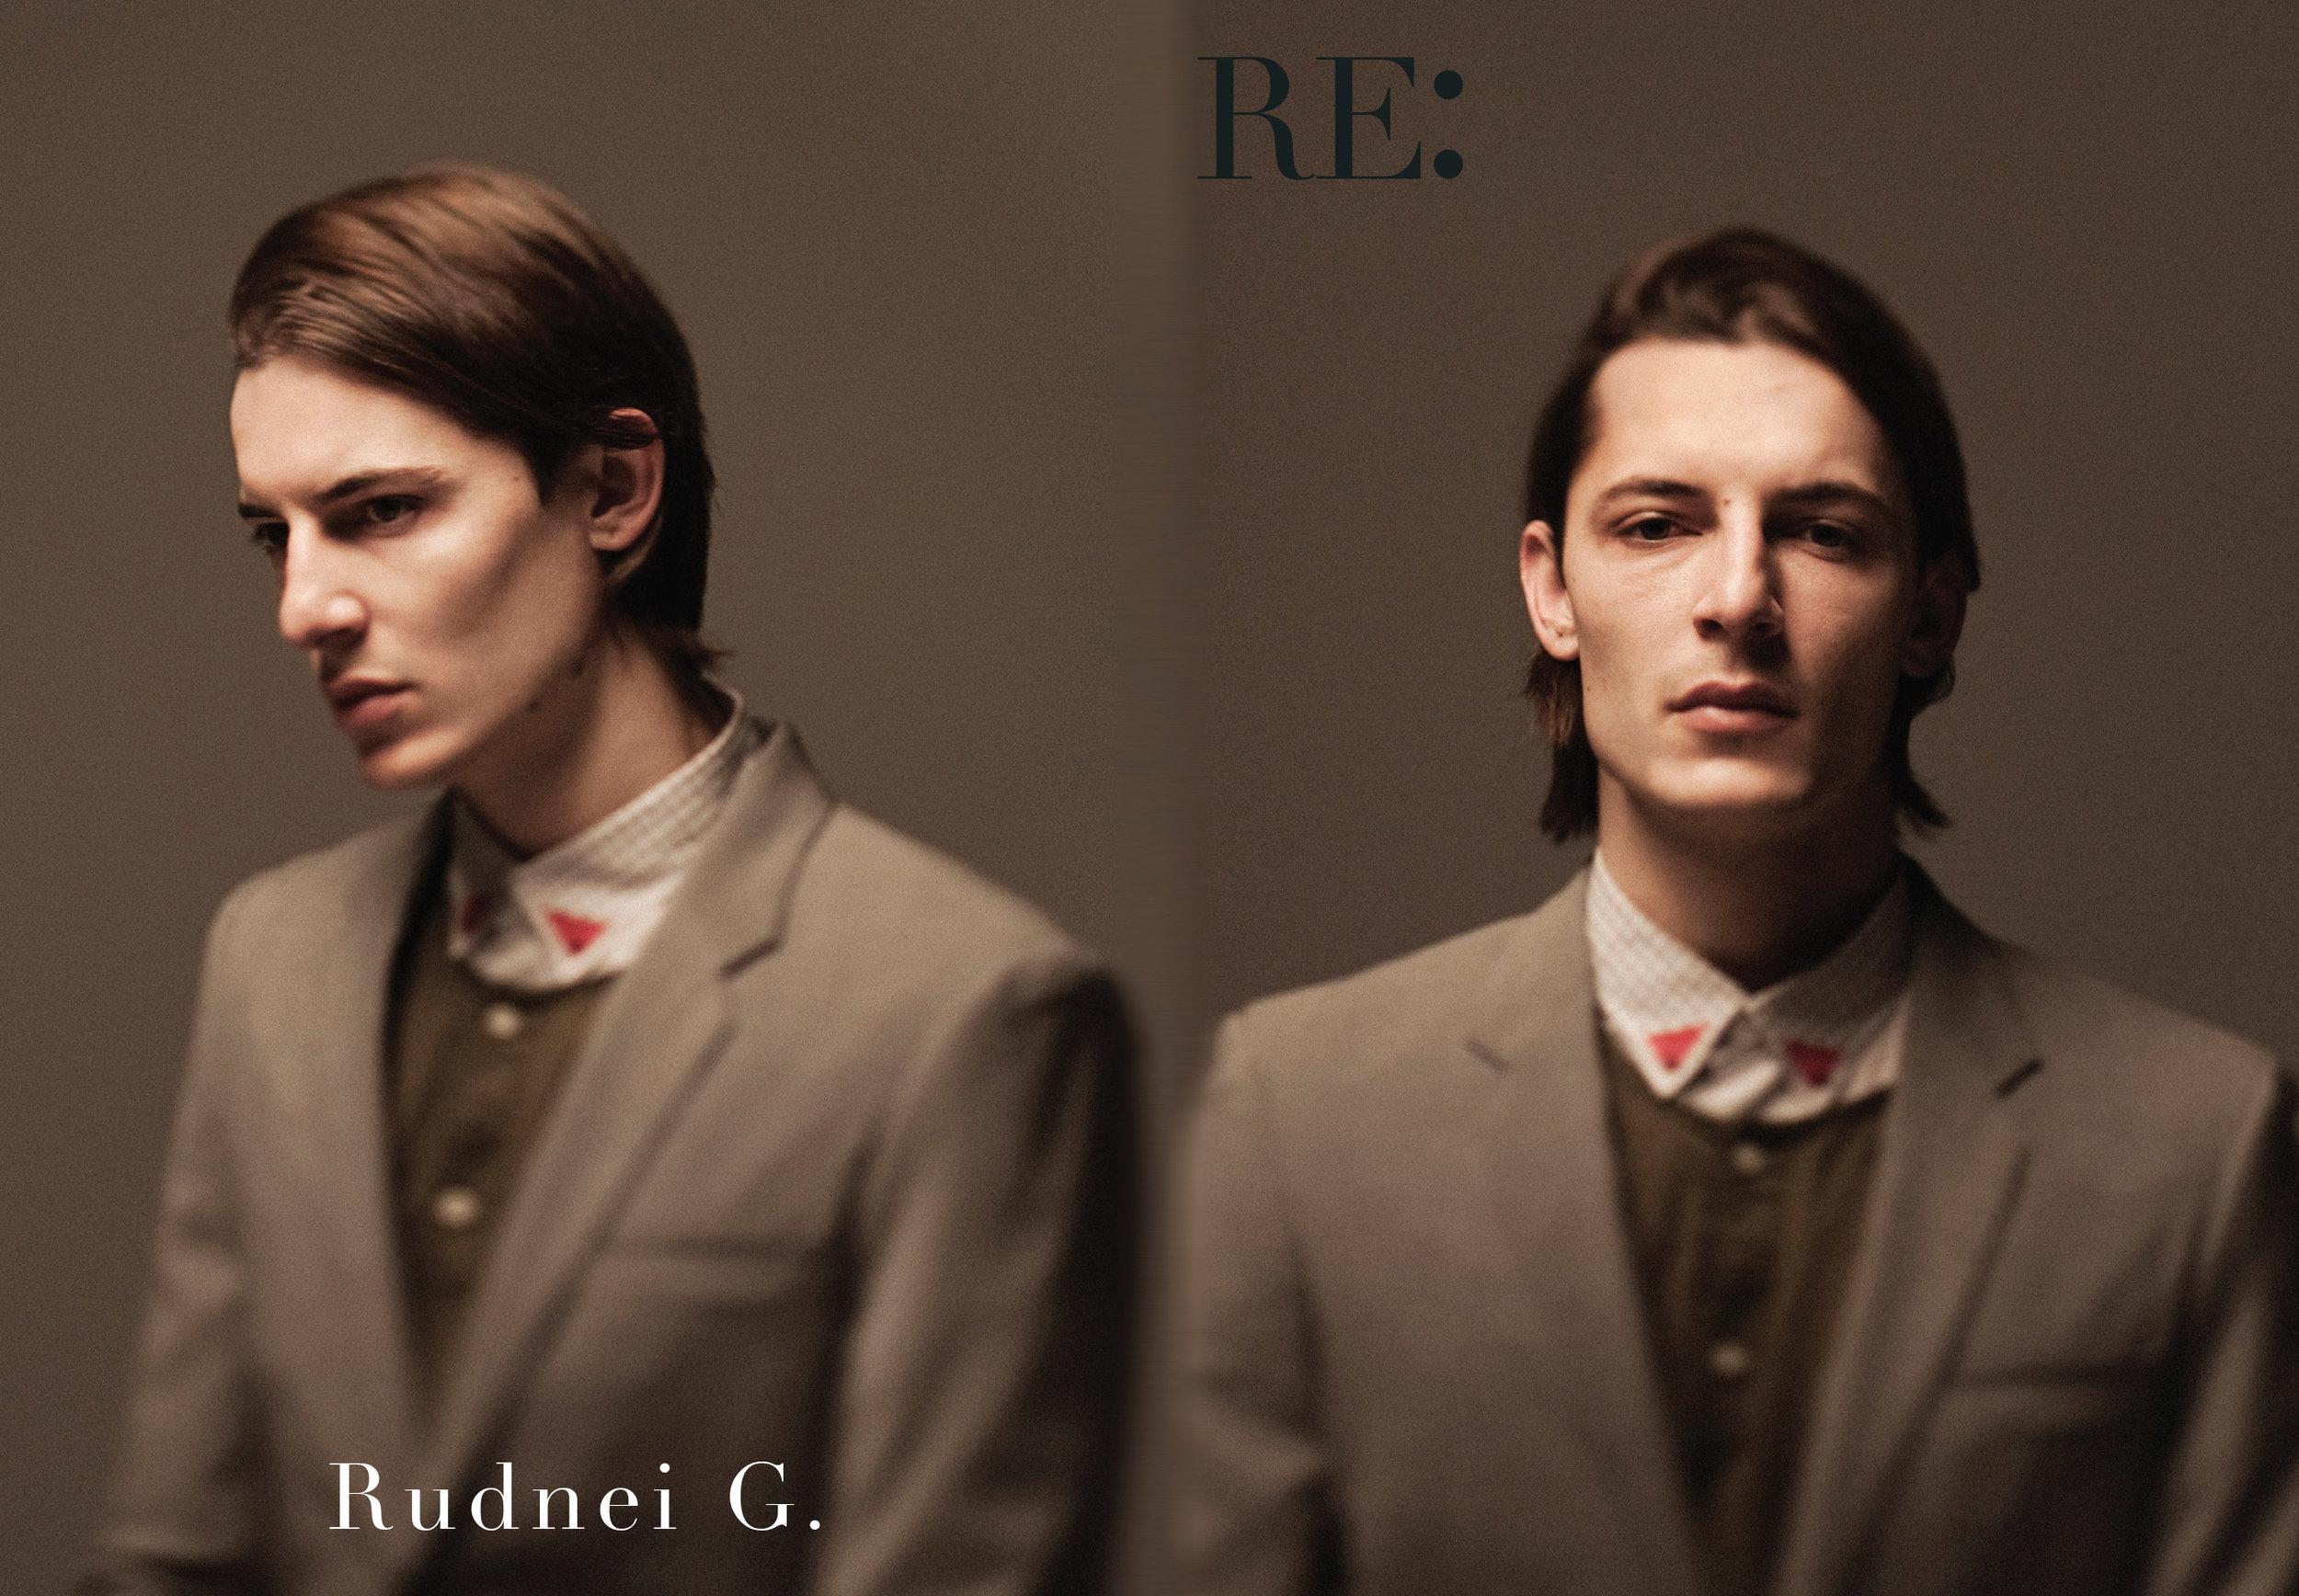 Rudnei G Print-1 copy.jpg